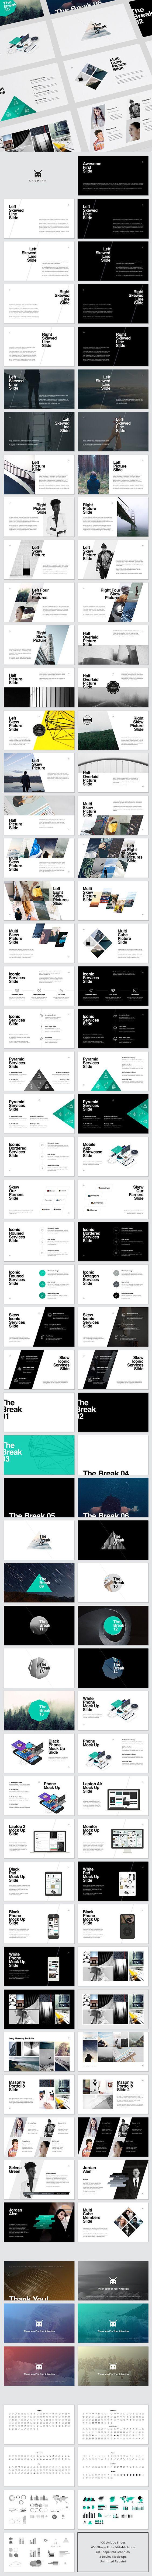 KASPIAN PowerPoint Presentation Template #slides #design Download: http://graphicriver.net/item/kaspian-powerpoint-presentation/14293362?ref=ksioks